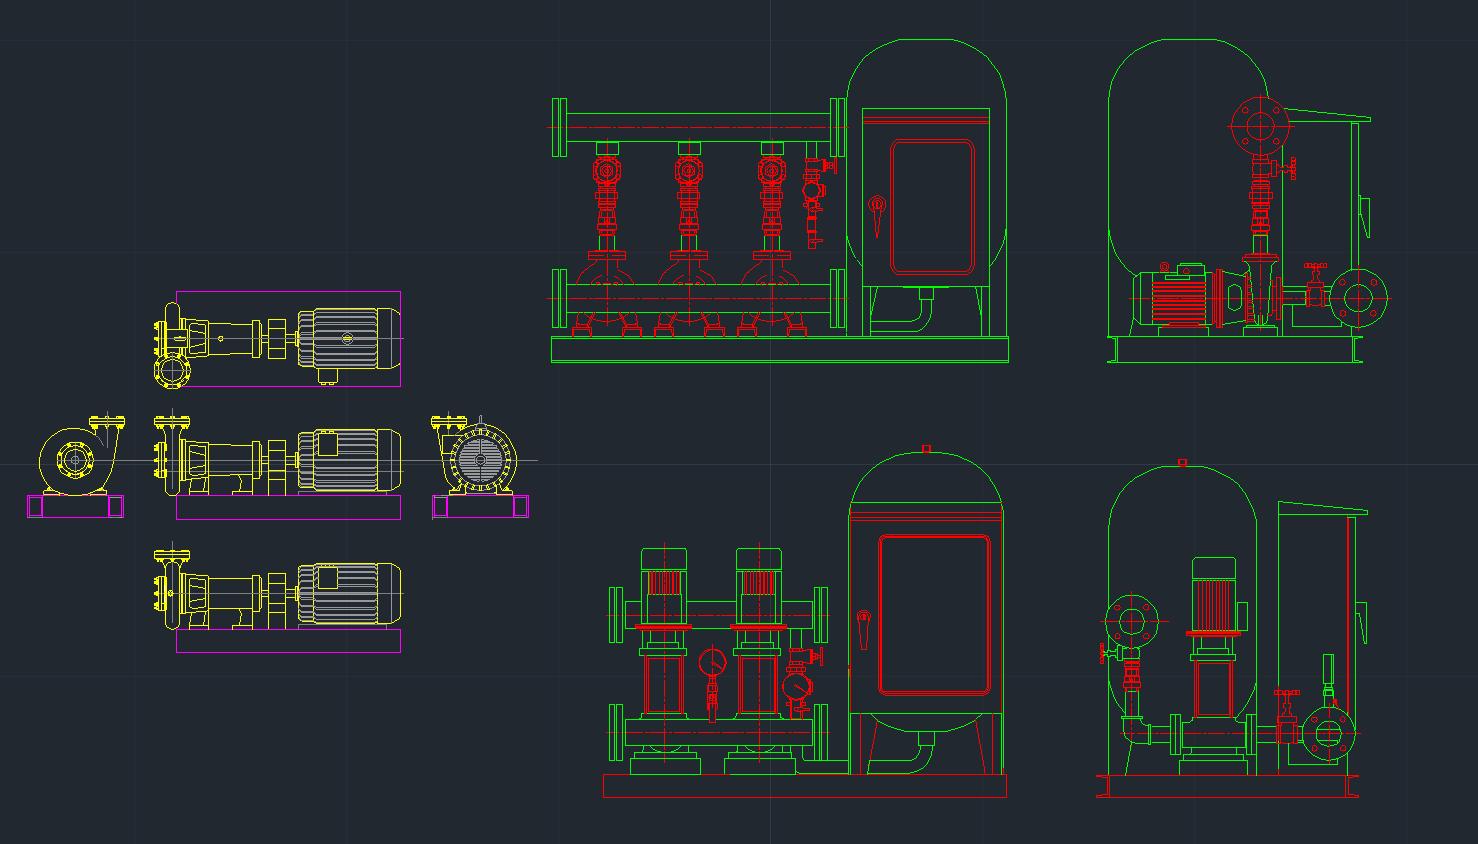 Booster Pump Autocad Free Cad Block Symbol And Cad Drawing